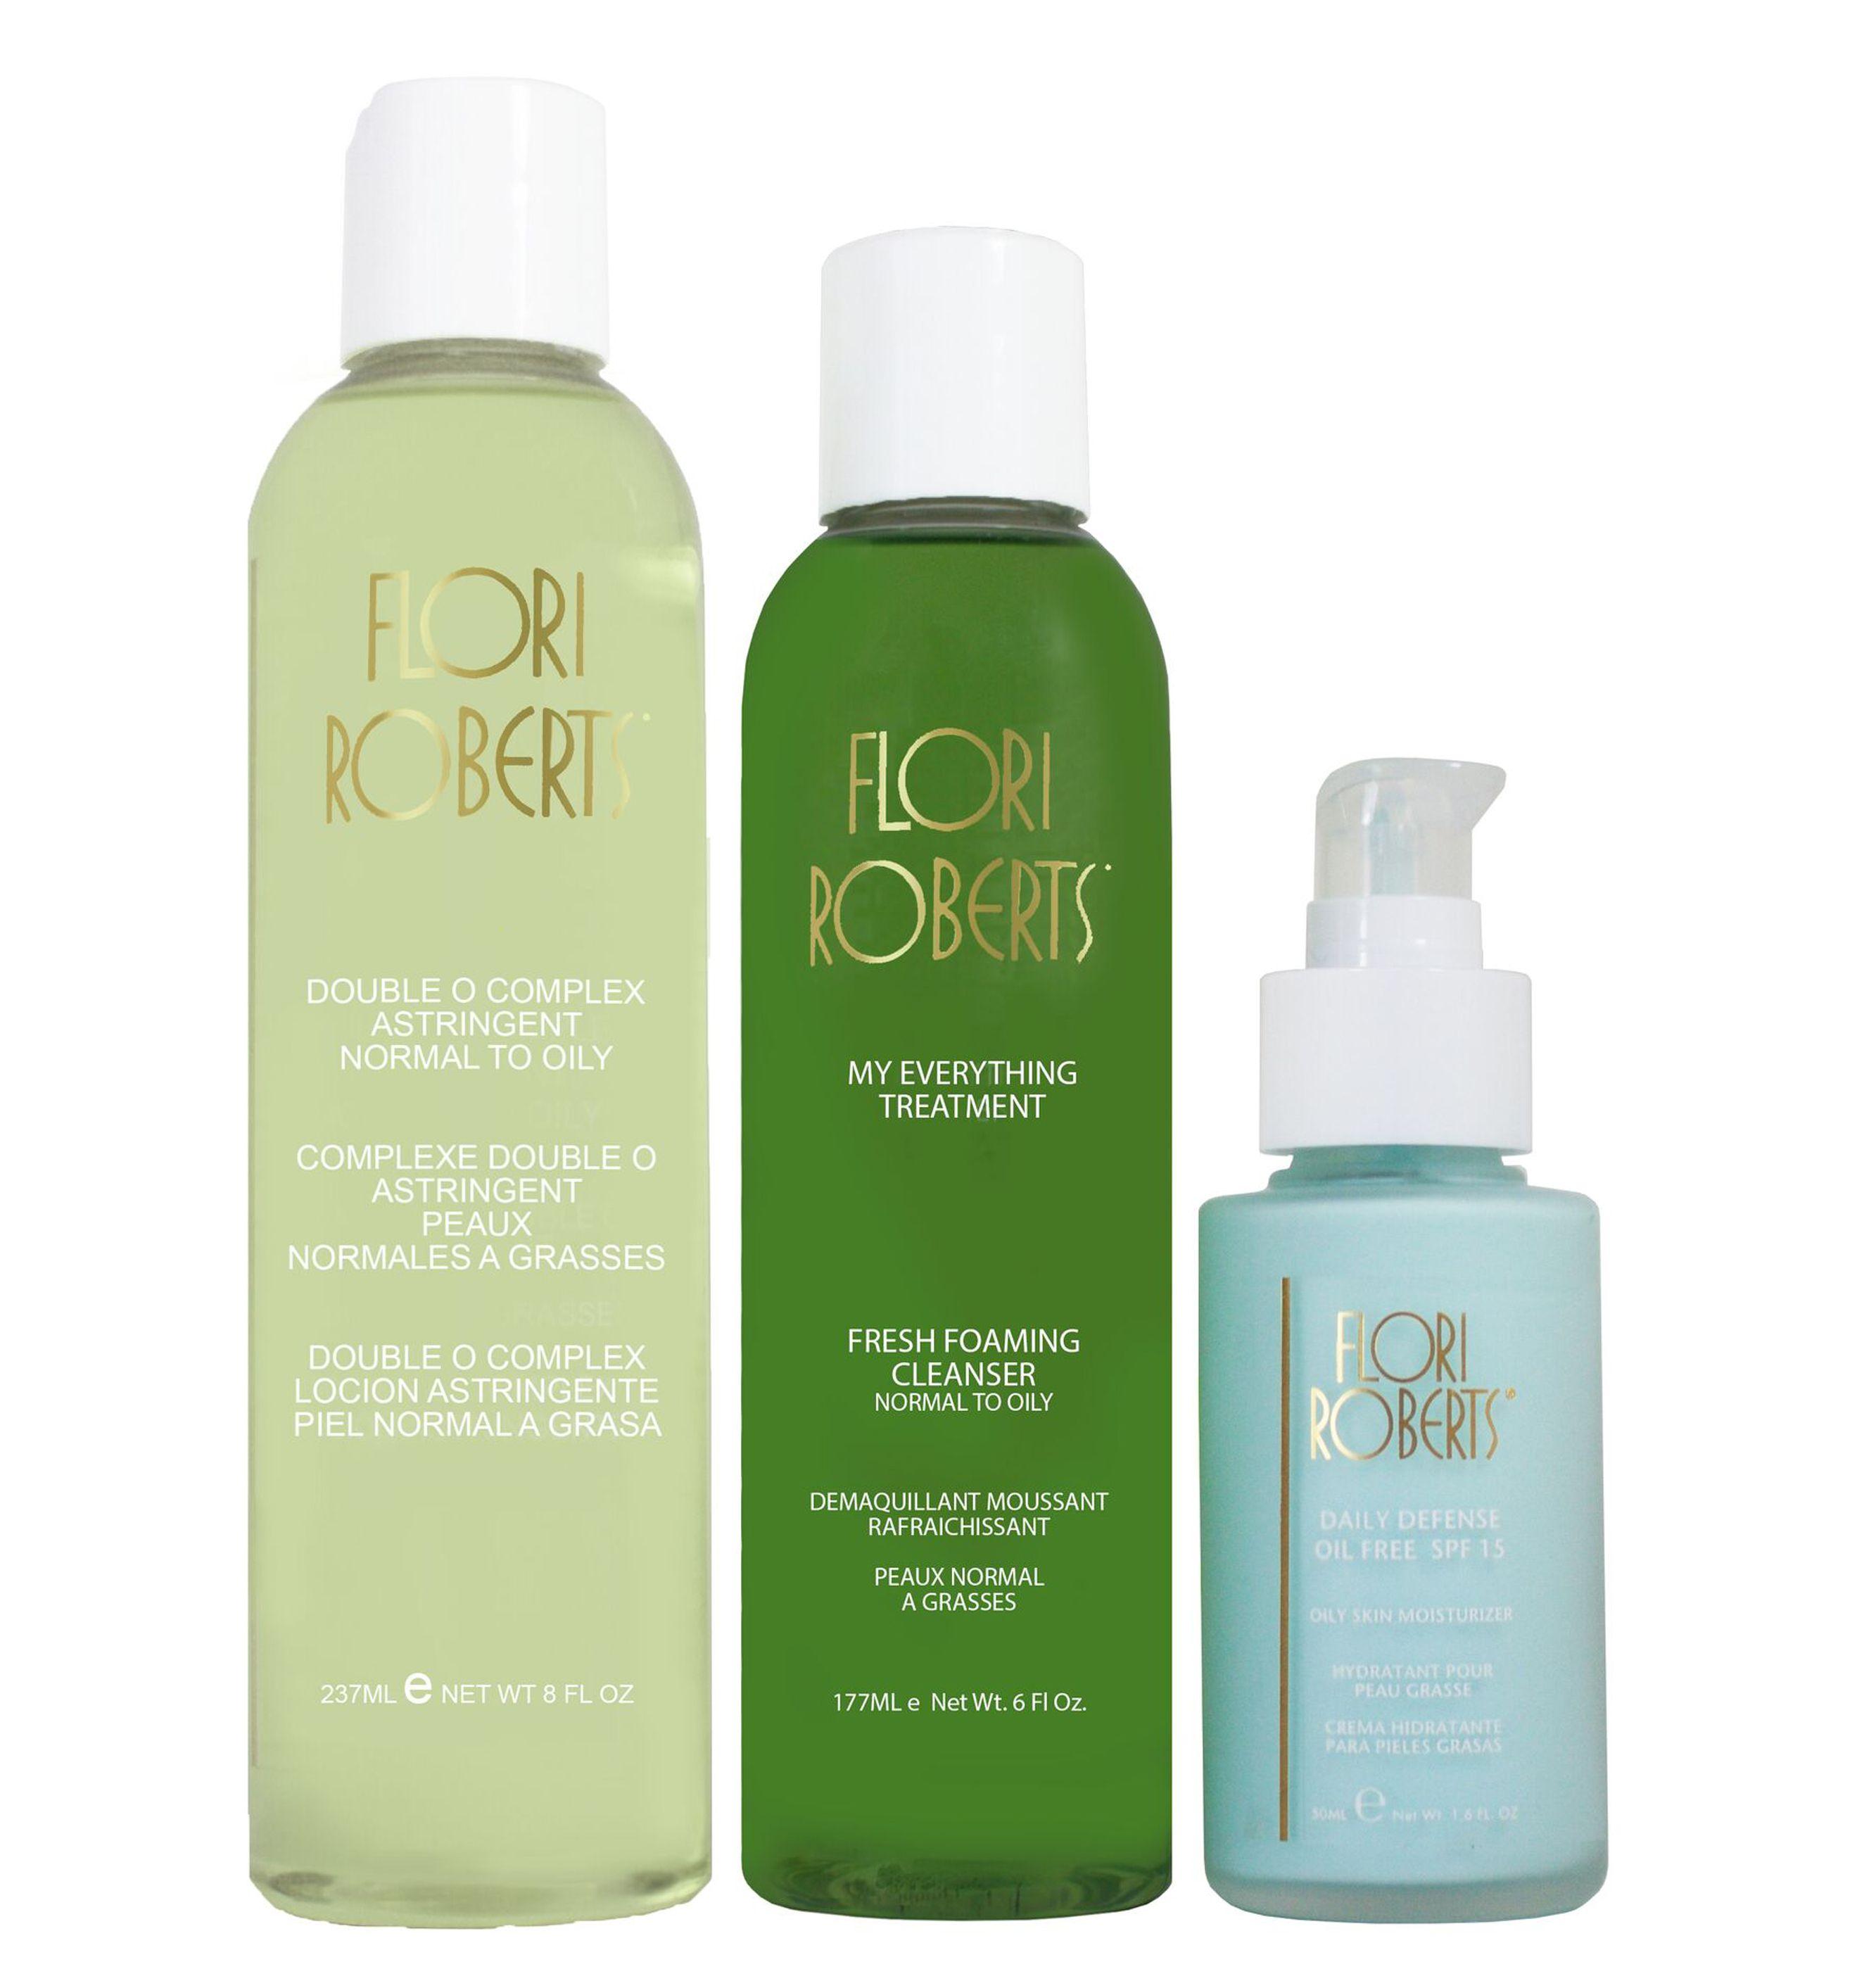 Flori Robertsfinest formulations in makeup,cosmetics and